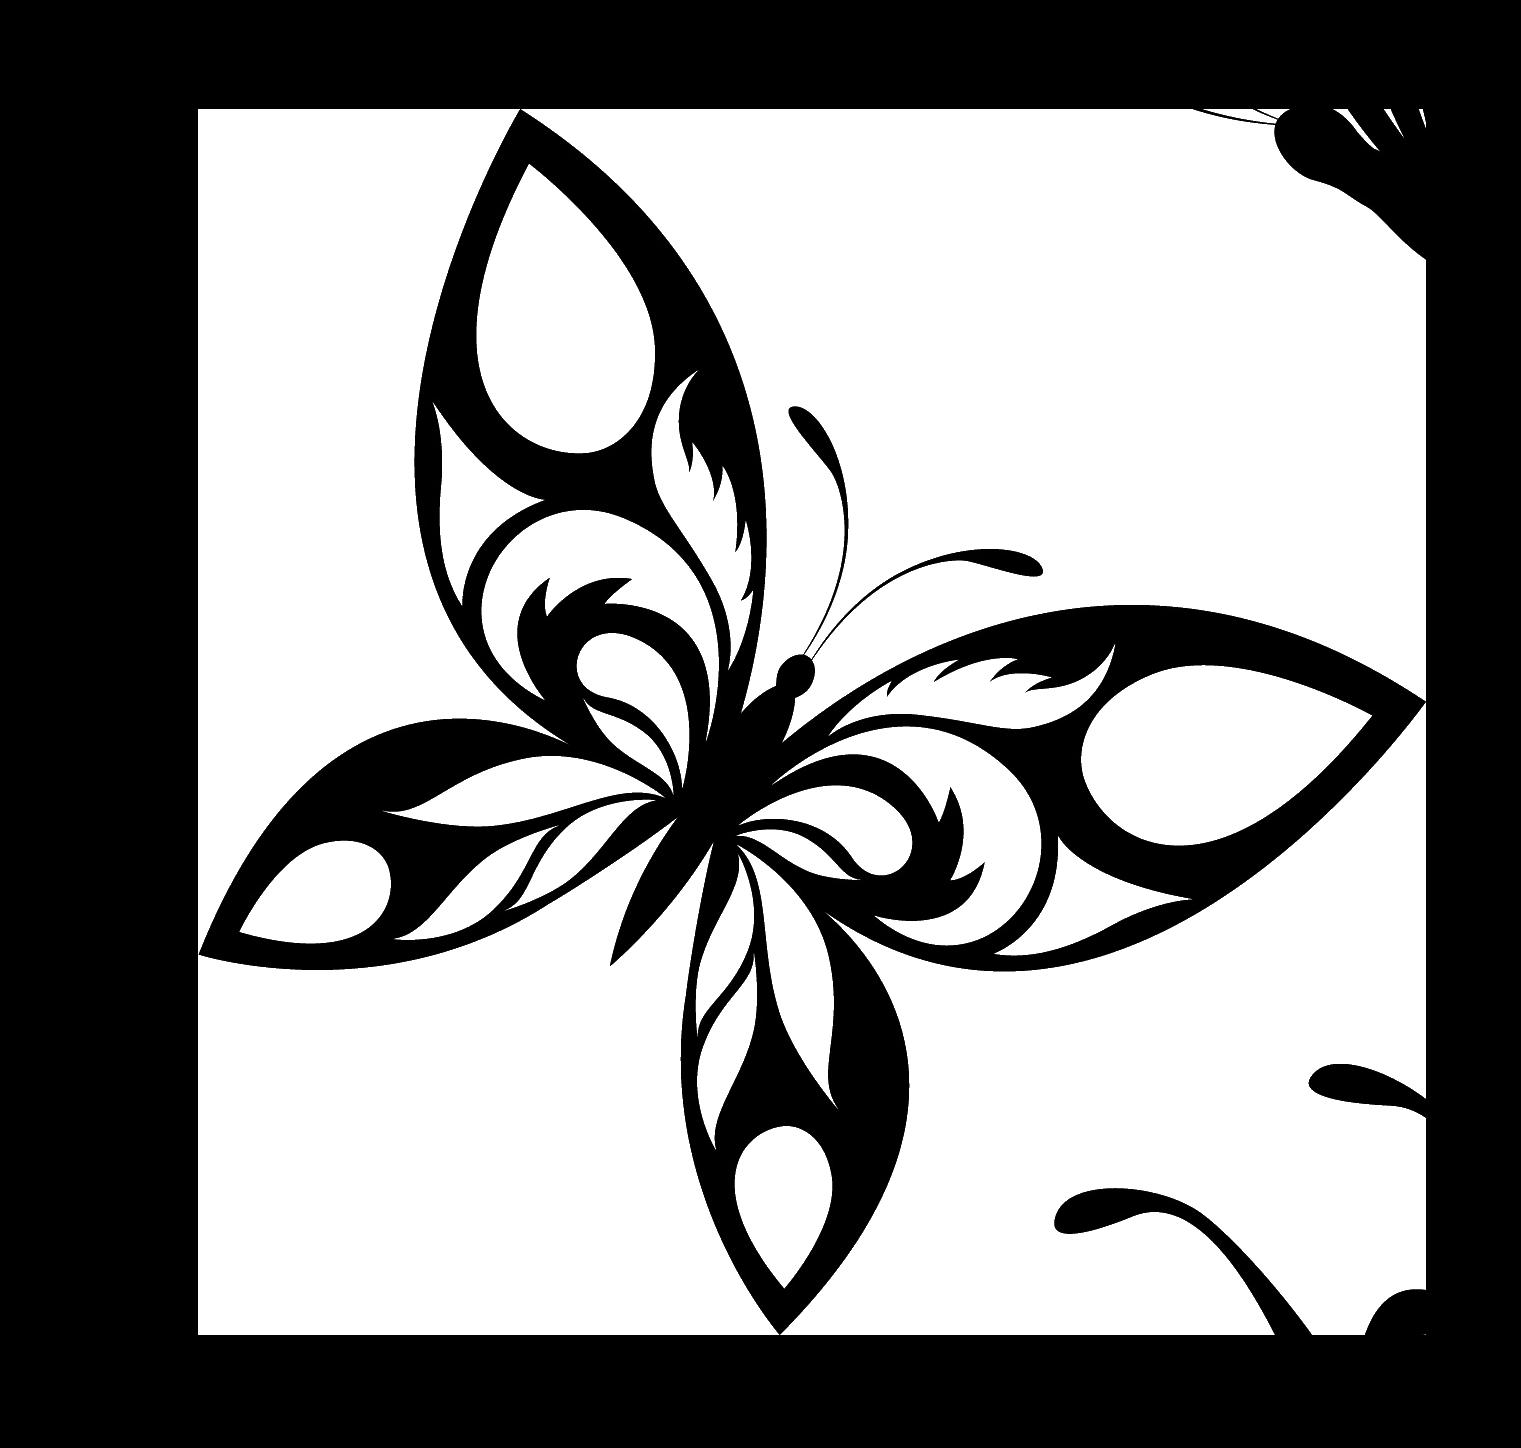 1521x1448 Creating Digital Tattoo S In Corel Paintshop Pro Knowledge Base